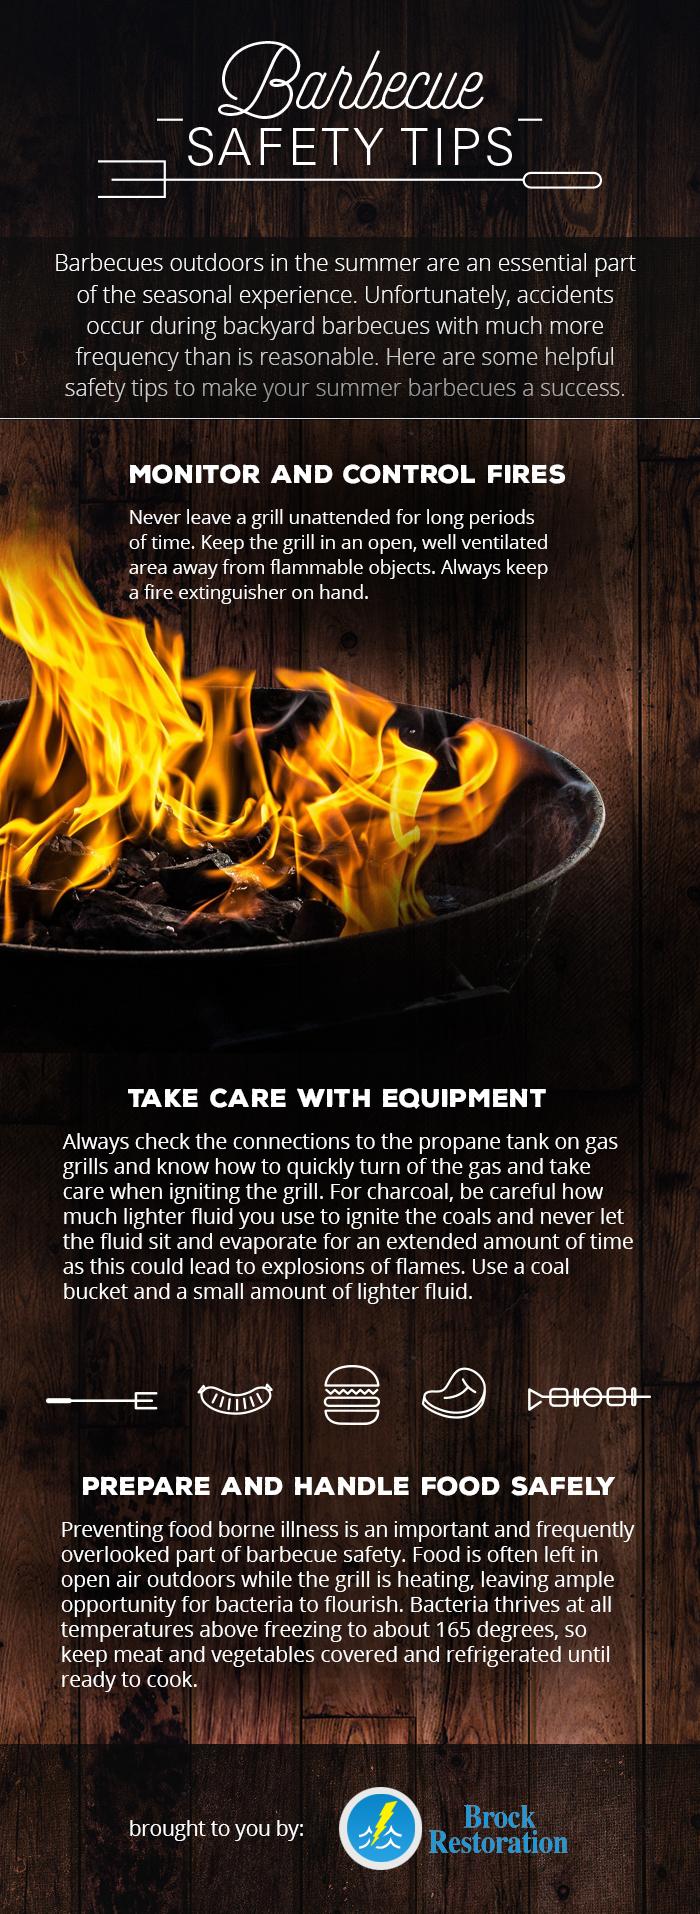 Brock restoration Barbecue-Tips